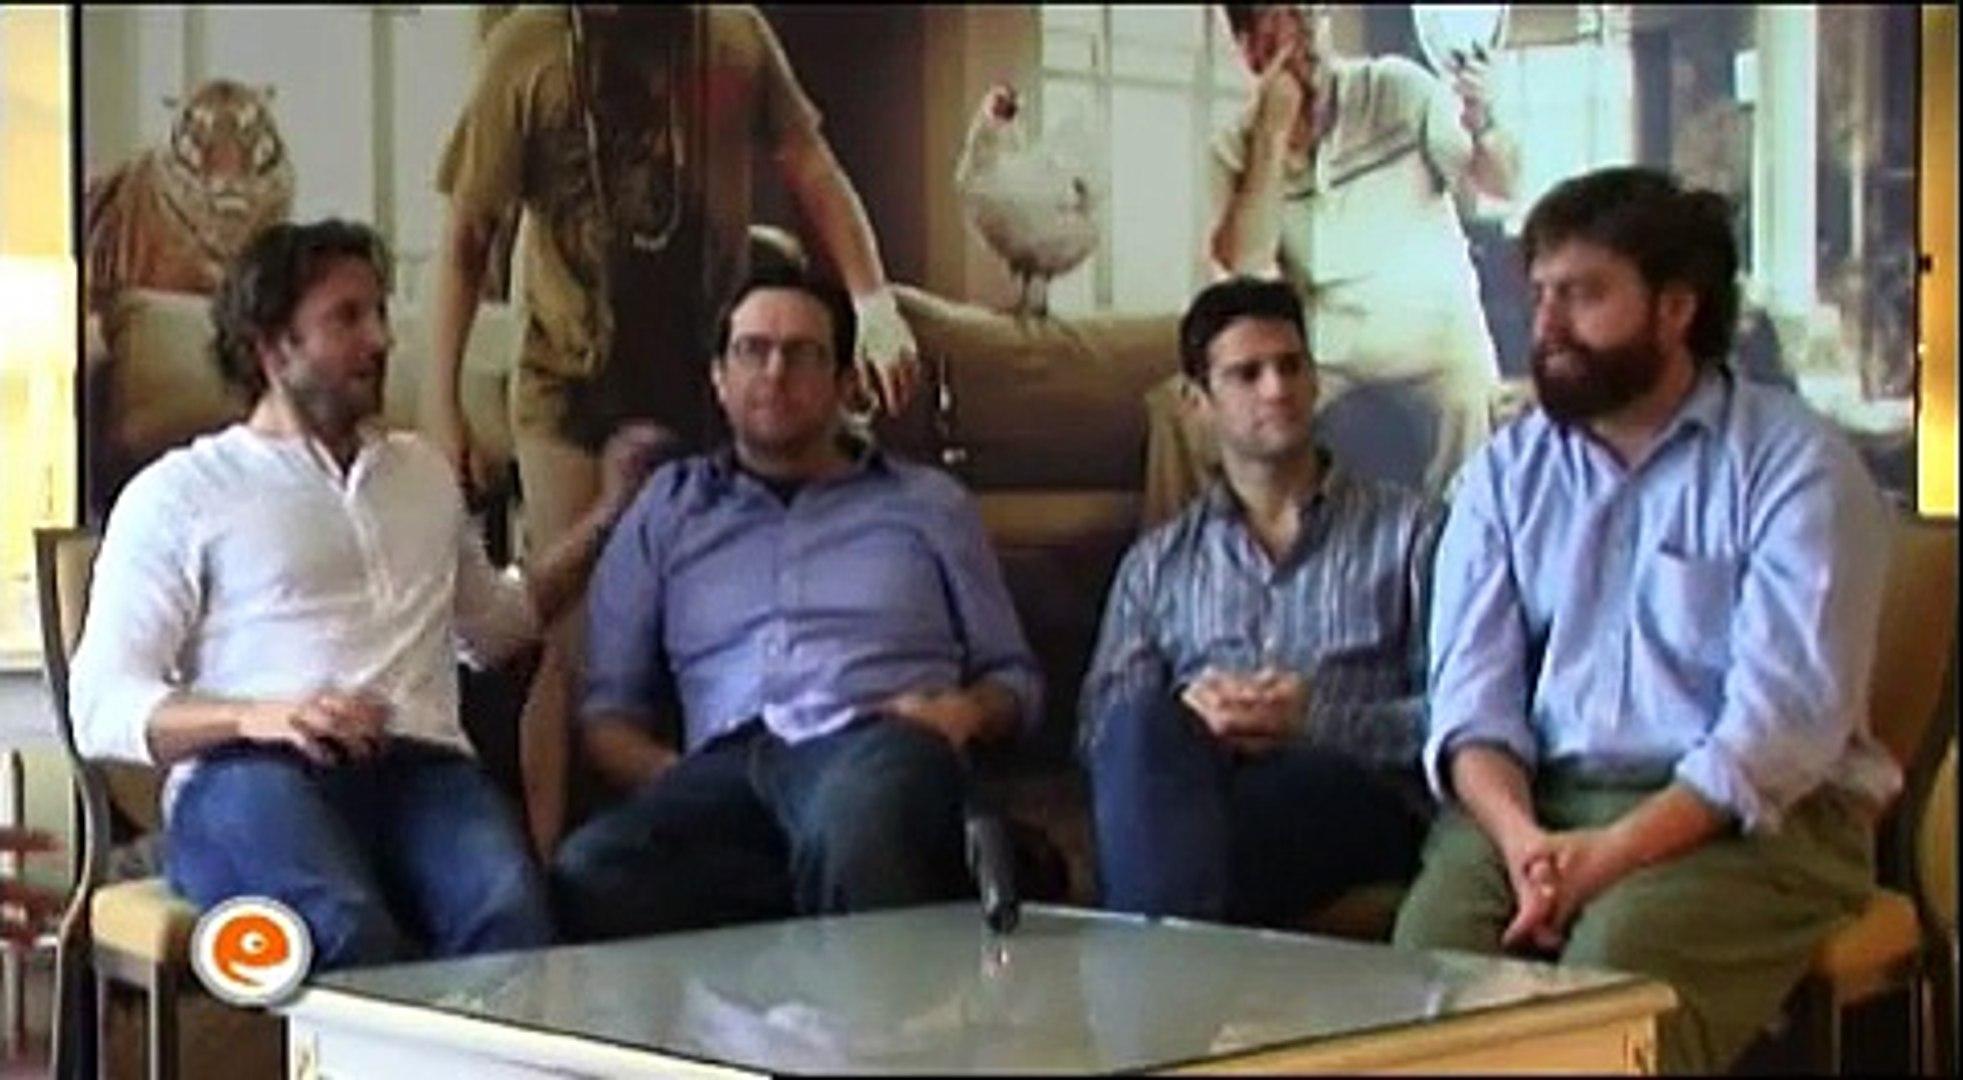 THE HANGOVER - Bradley Cooper, Ed Helms, Zach Galifianakis, Justin Bartha